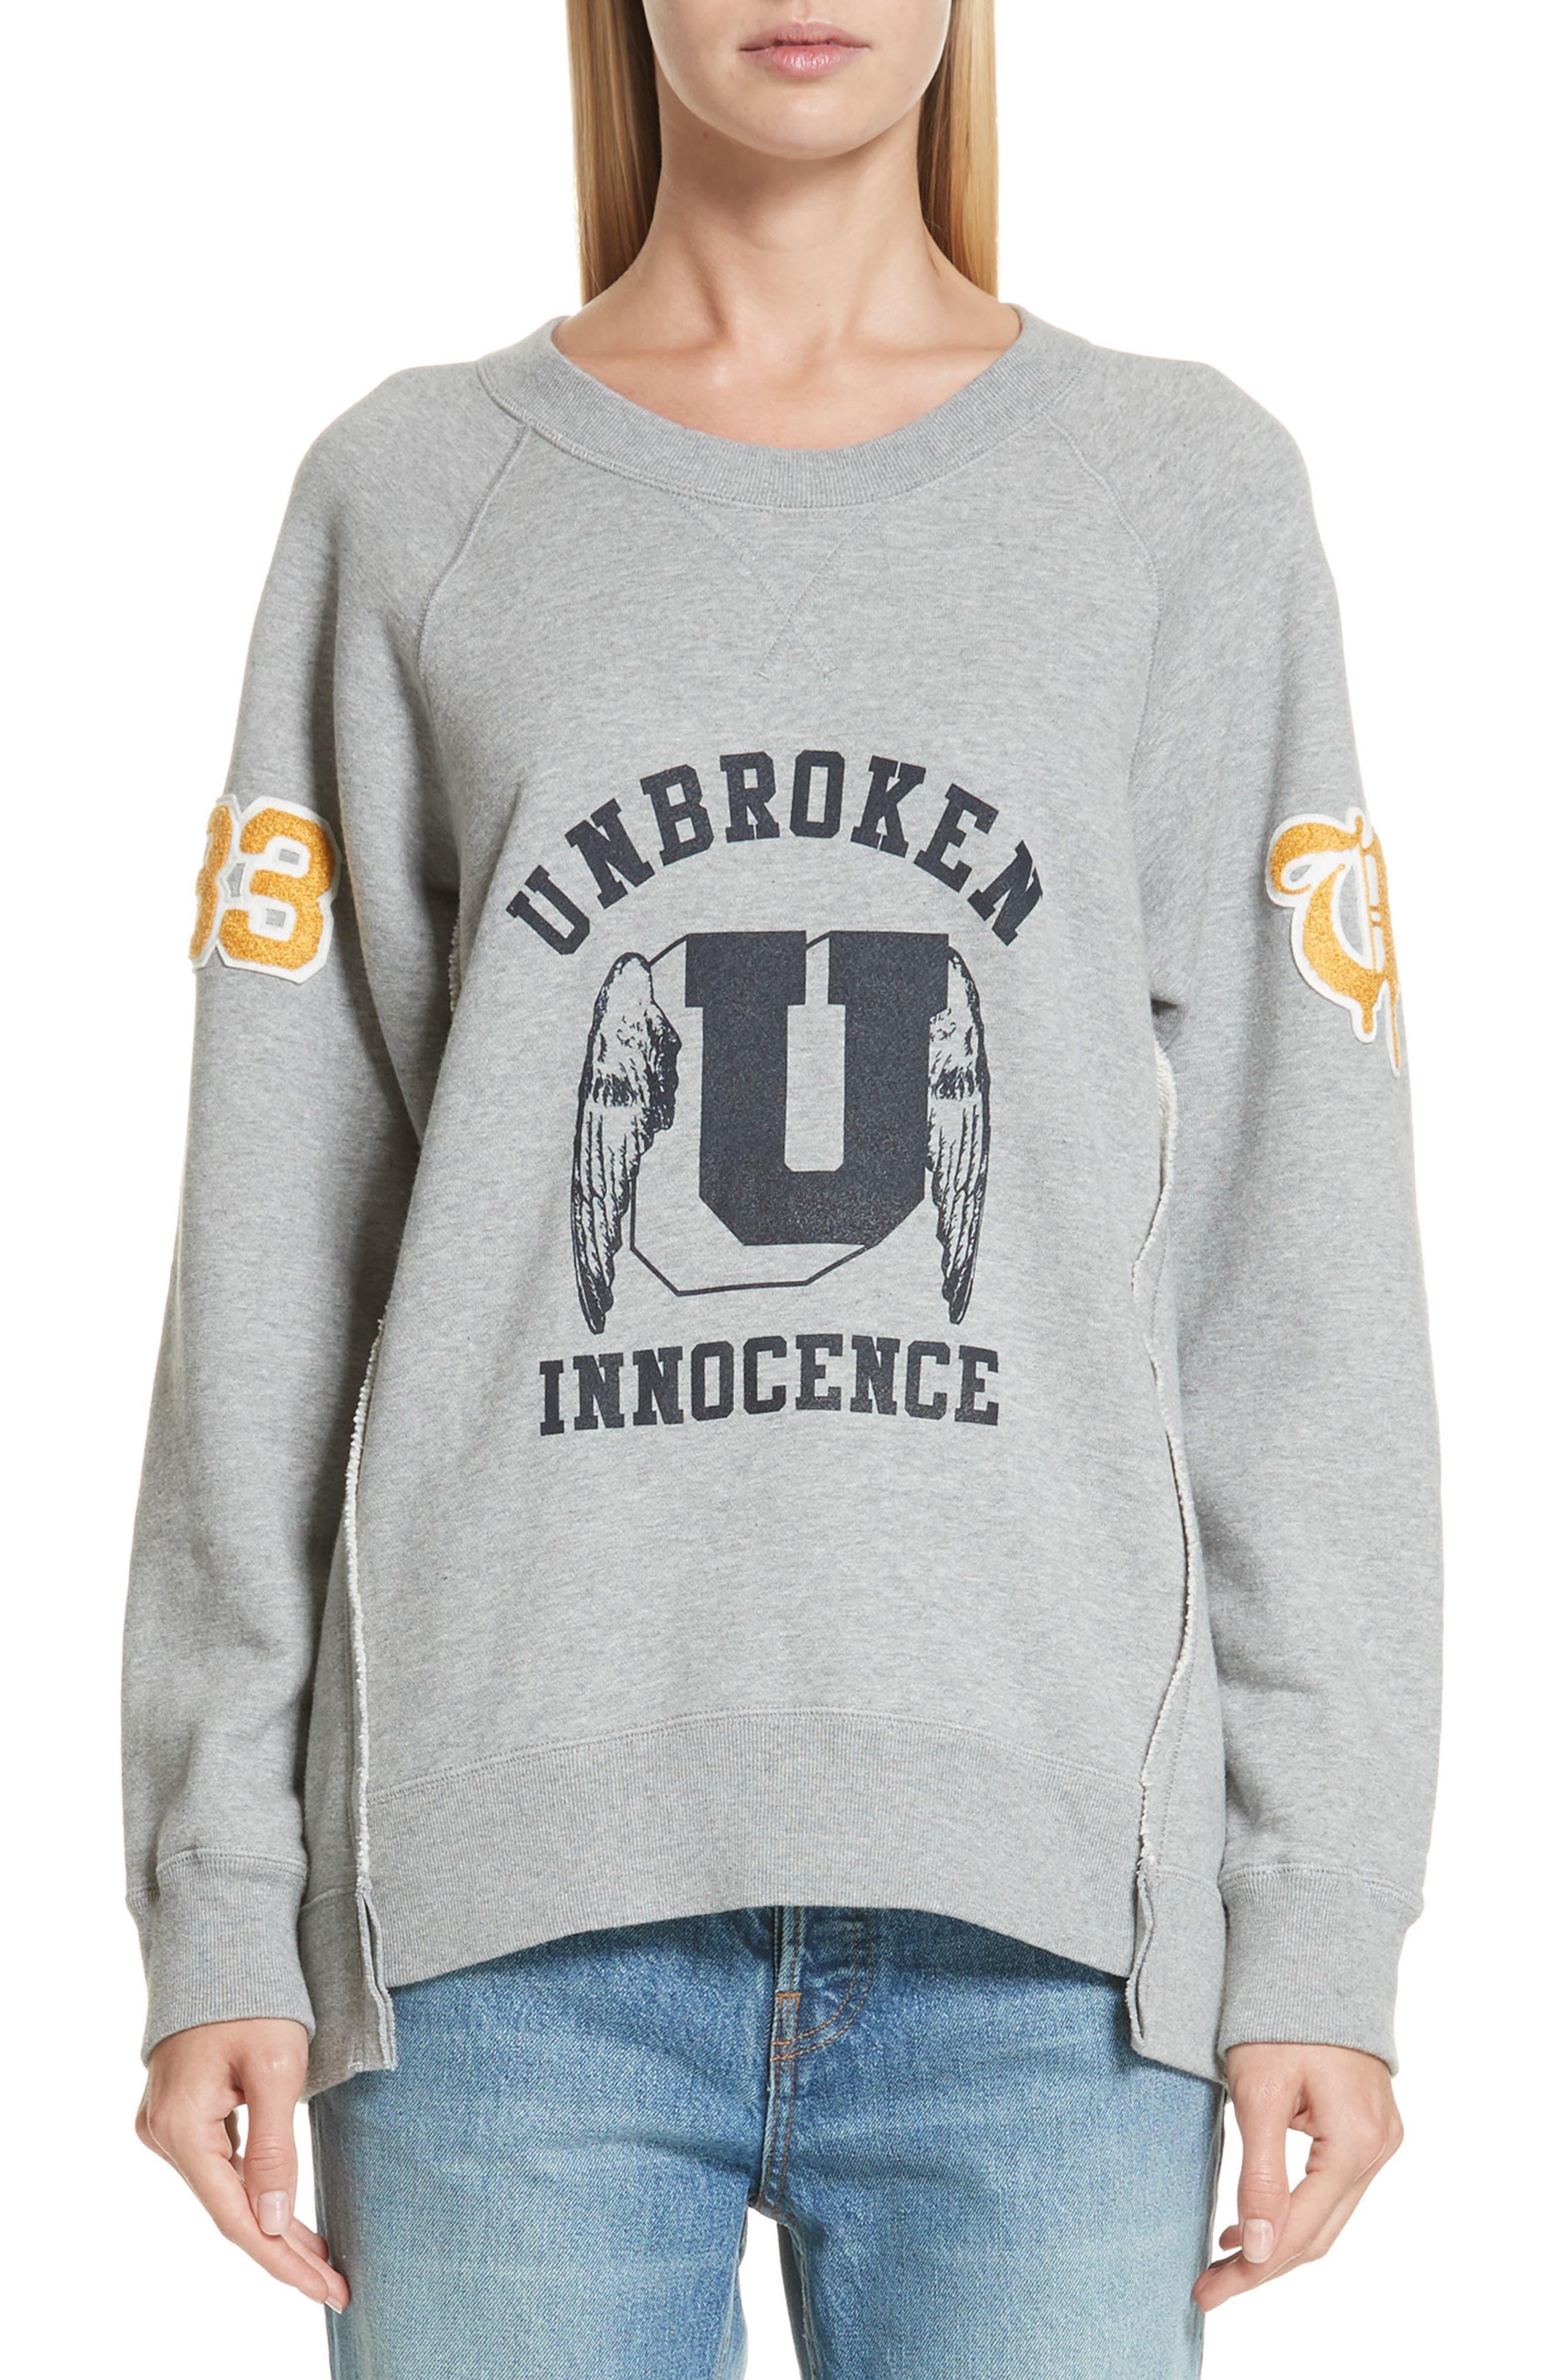 Unbroken Innocence Sweatshirt,                         Main,                         color, B TOP GRAY